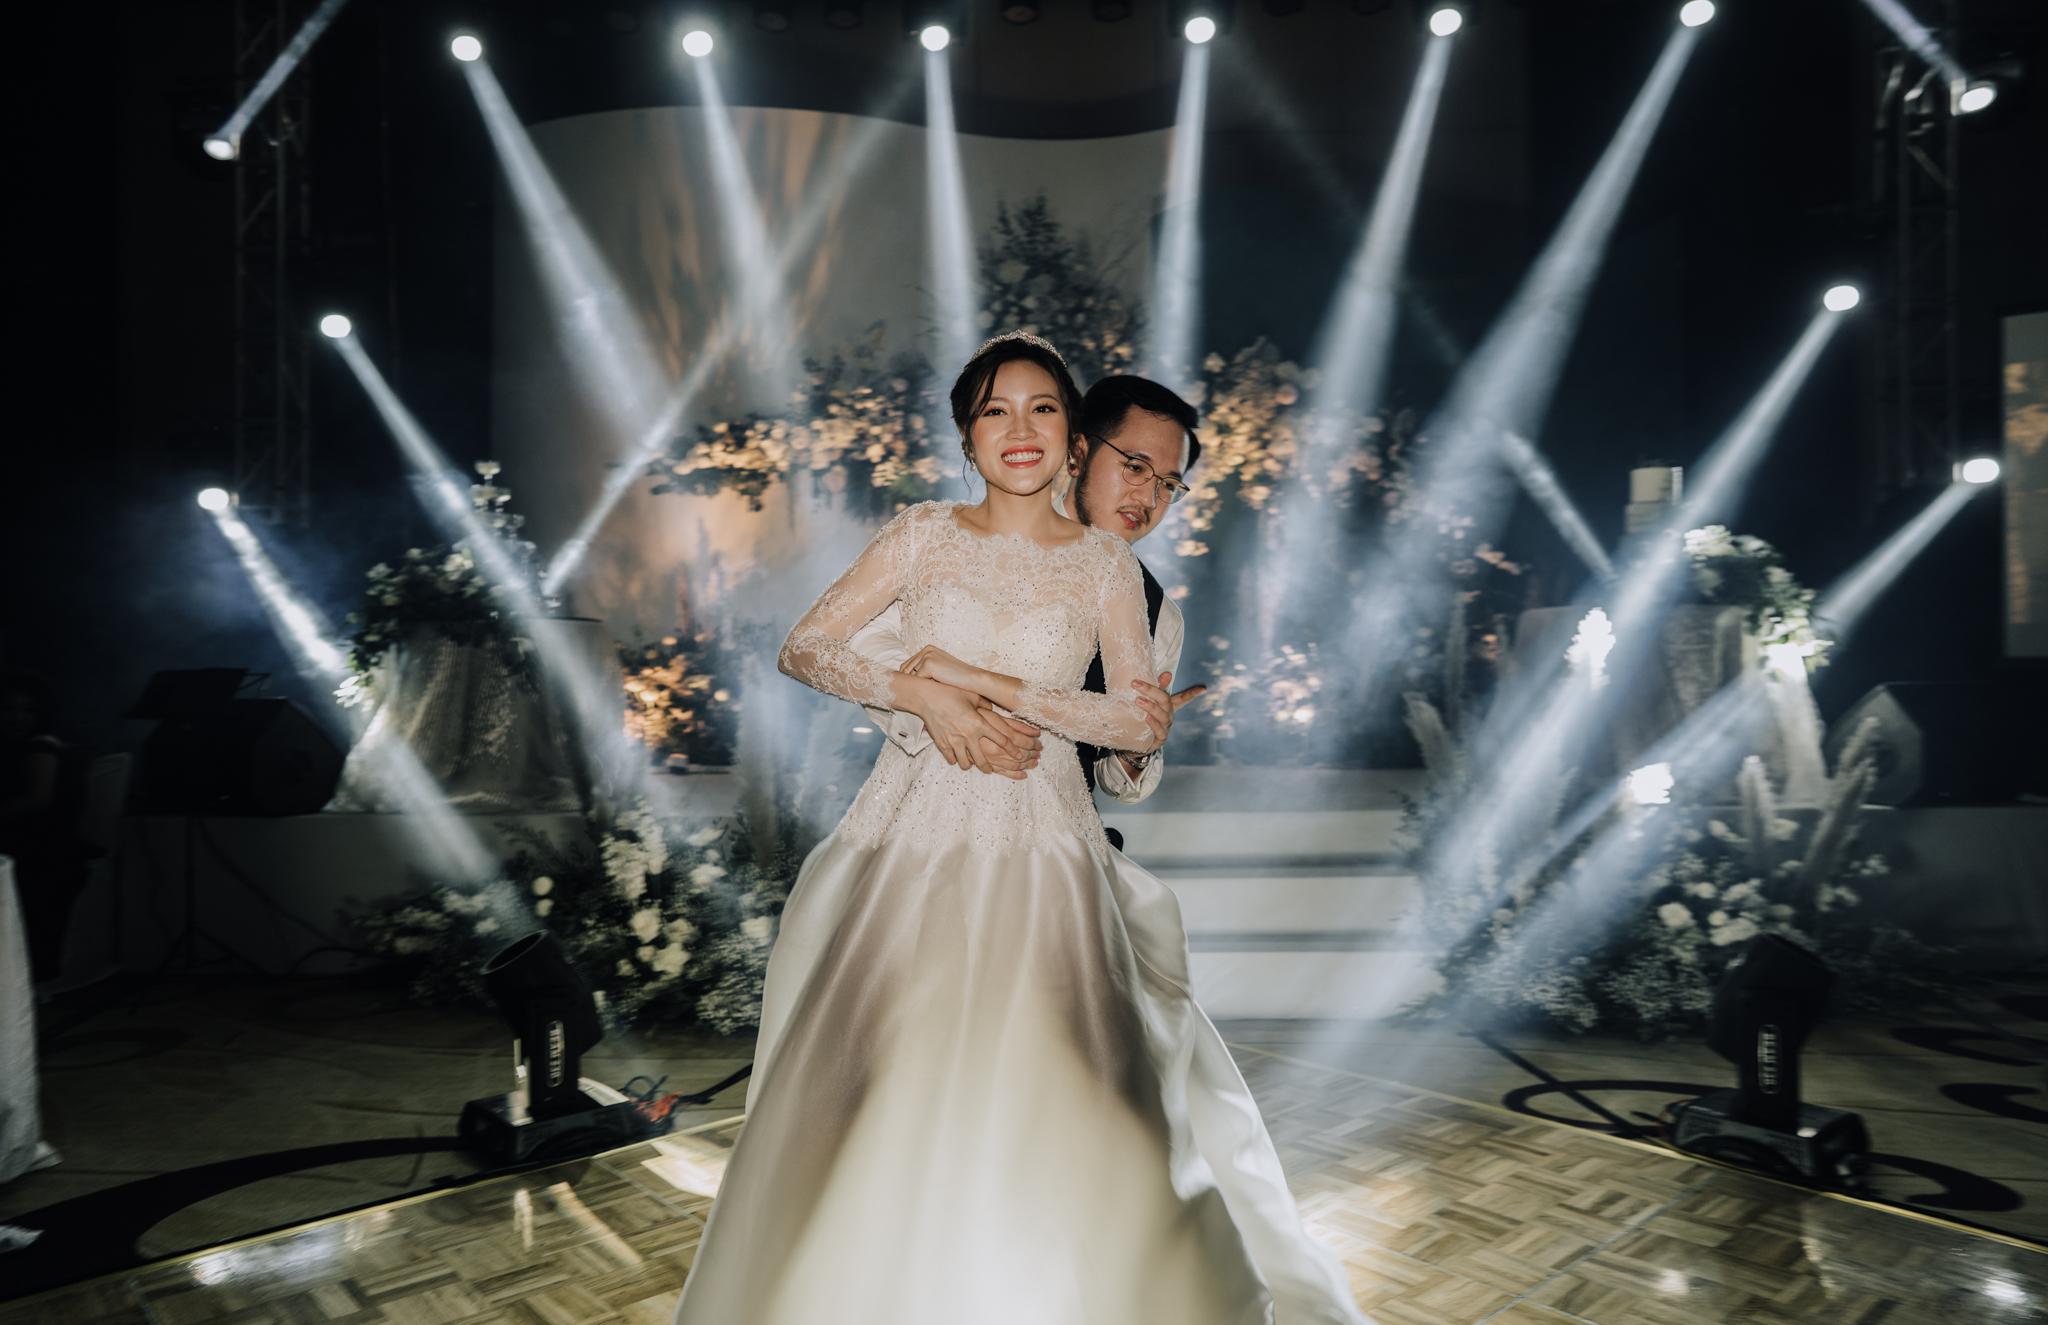 JWMarriott Ha Noi Intimate Wedding of Trang Hi well captured by Hipster Wedding Vietnam Wedding Photographer-36432.jpg